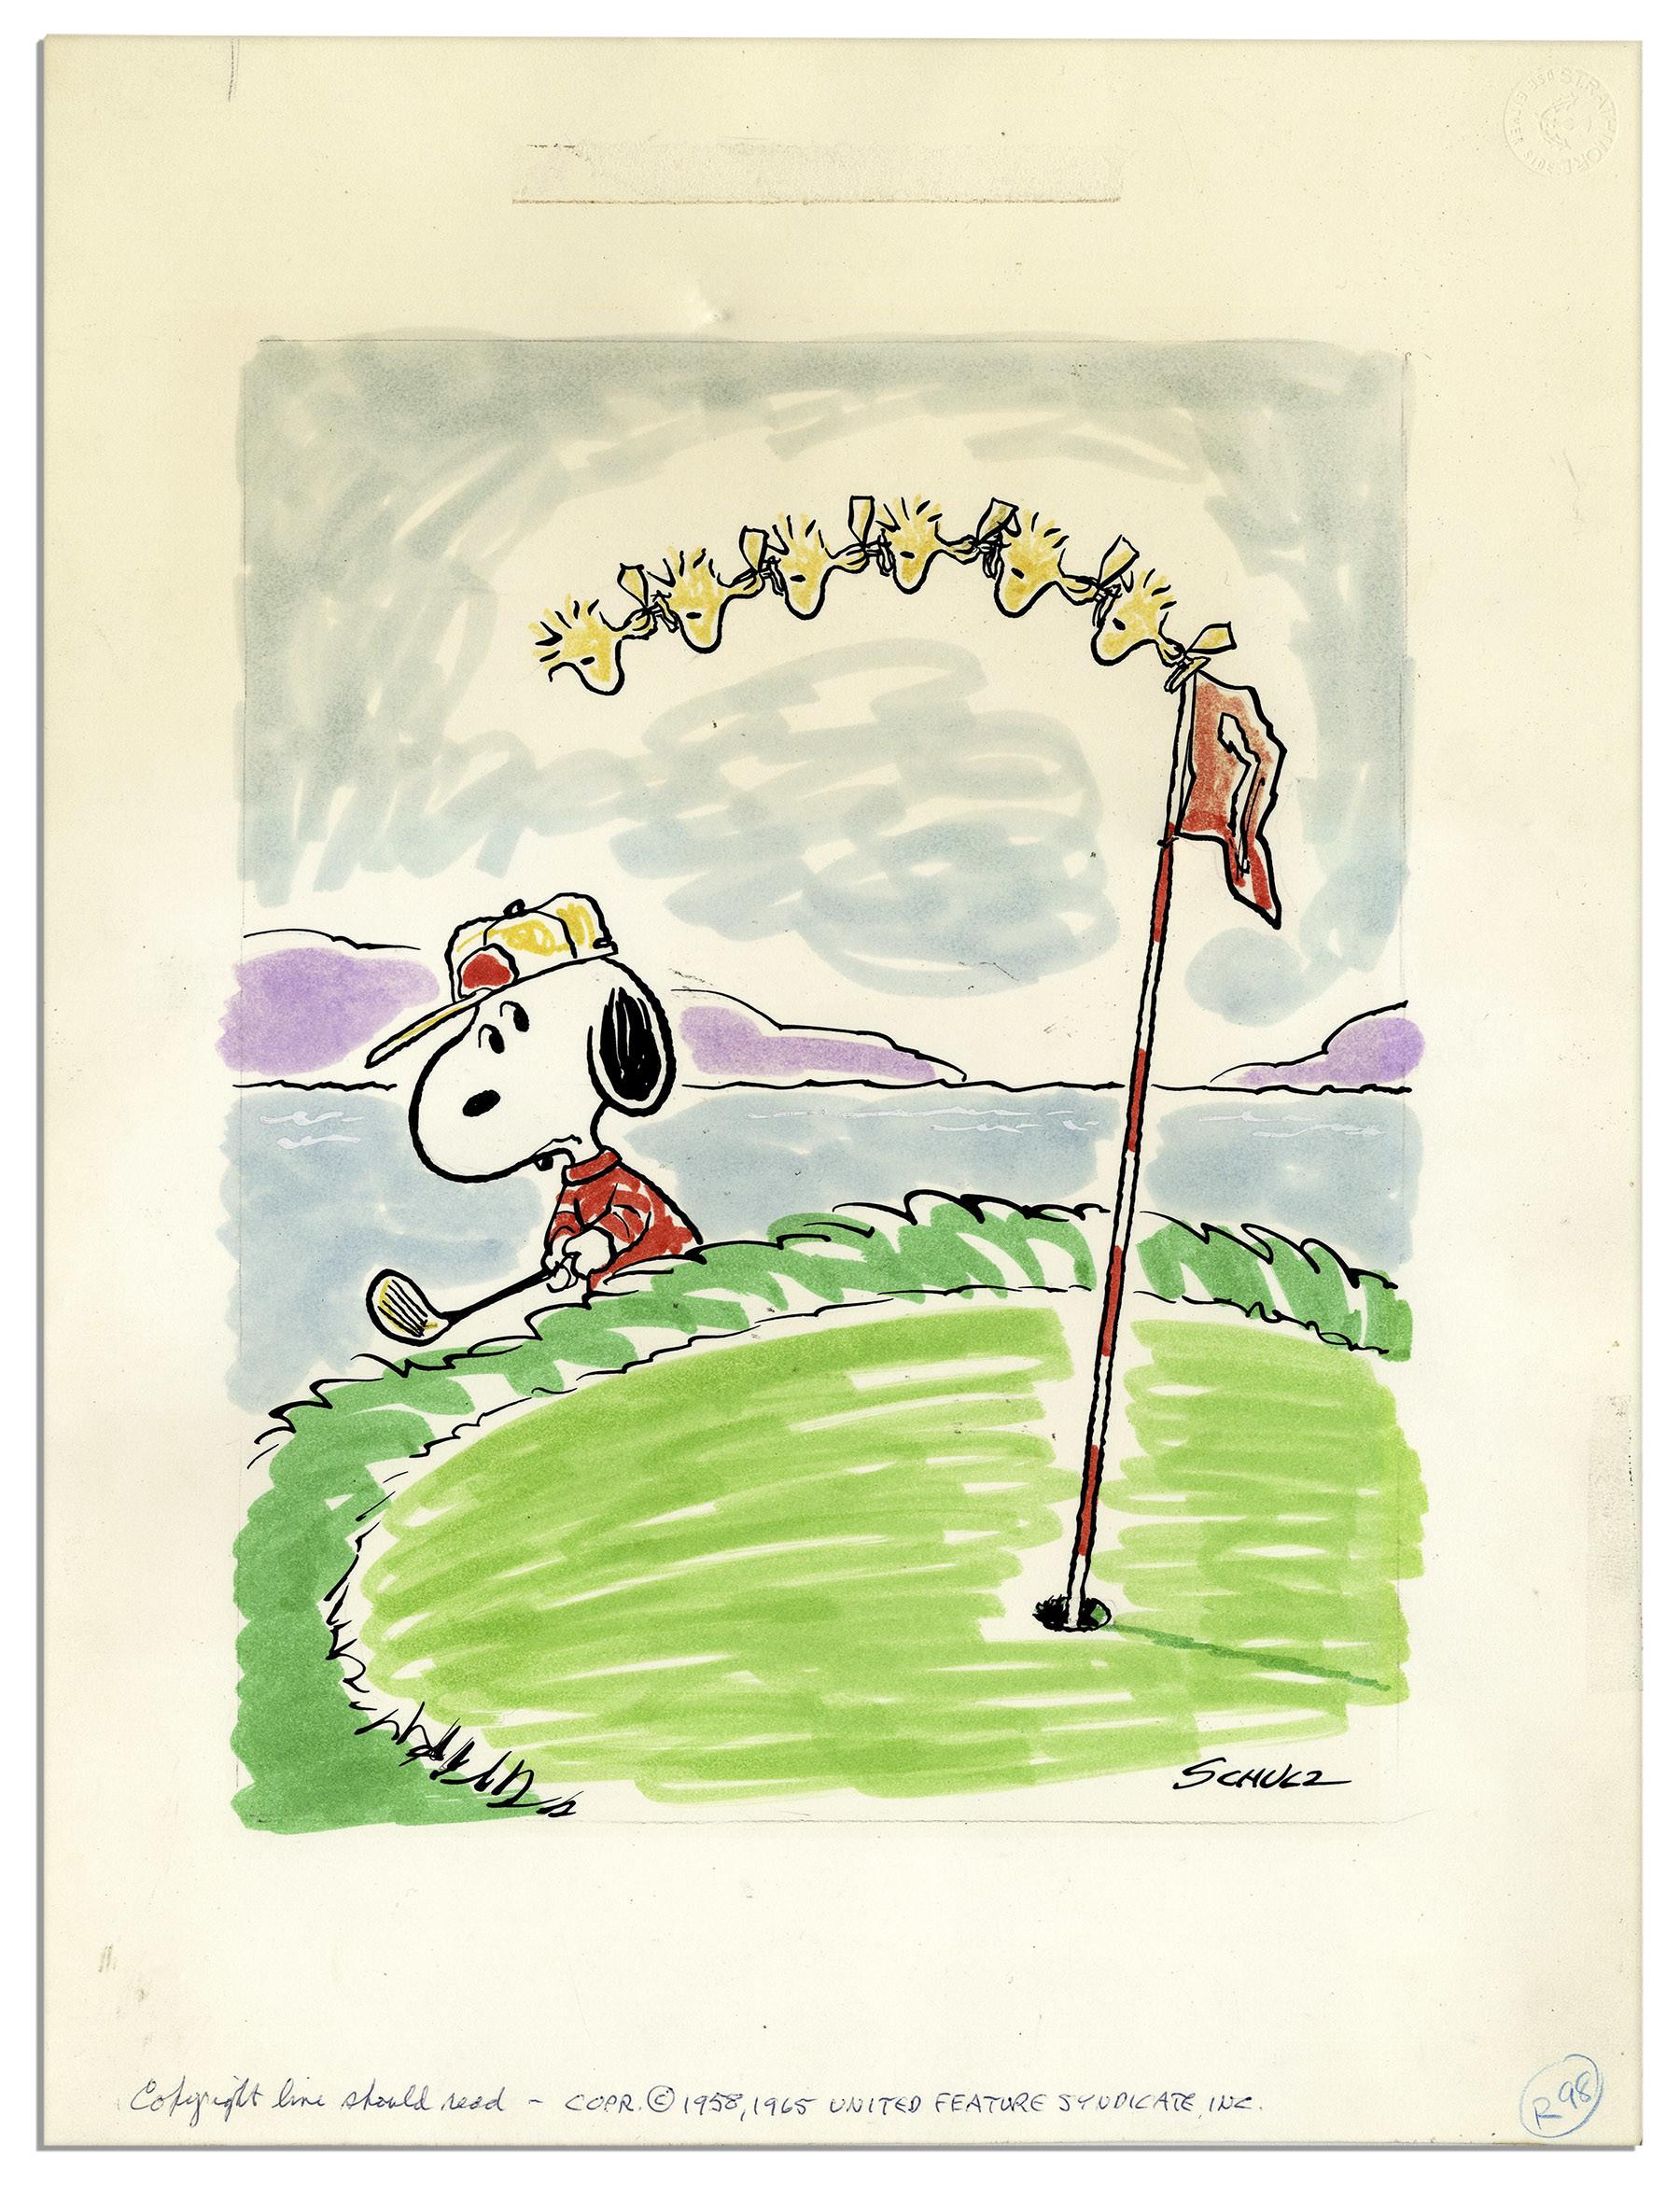 Charles Schulz ''Peanuts'' Golf Theme Color Original Artwork Starring  Snoopy & Woodstock